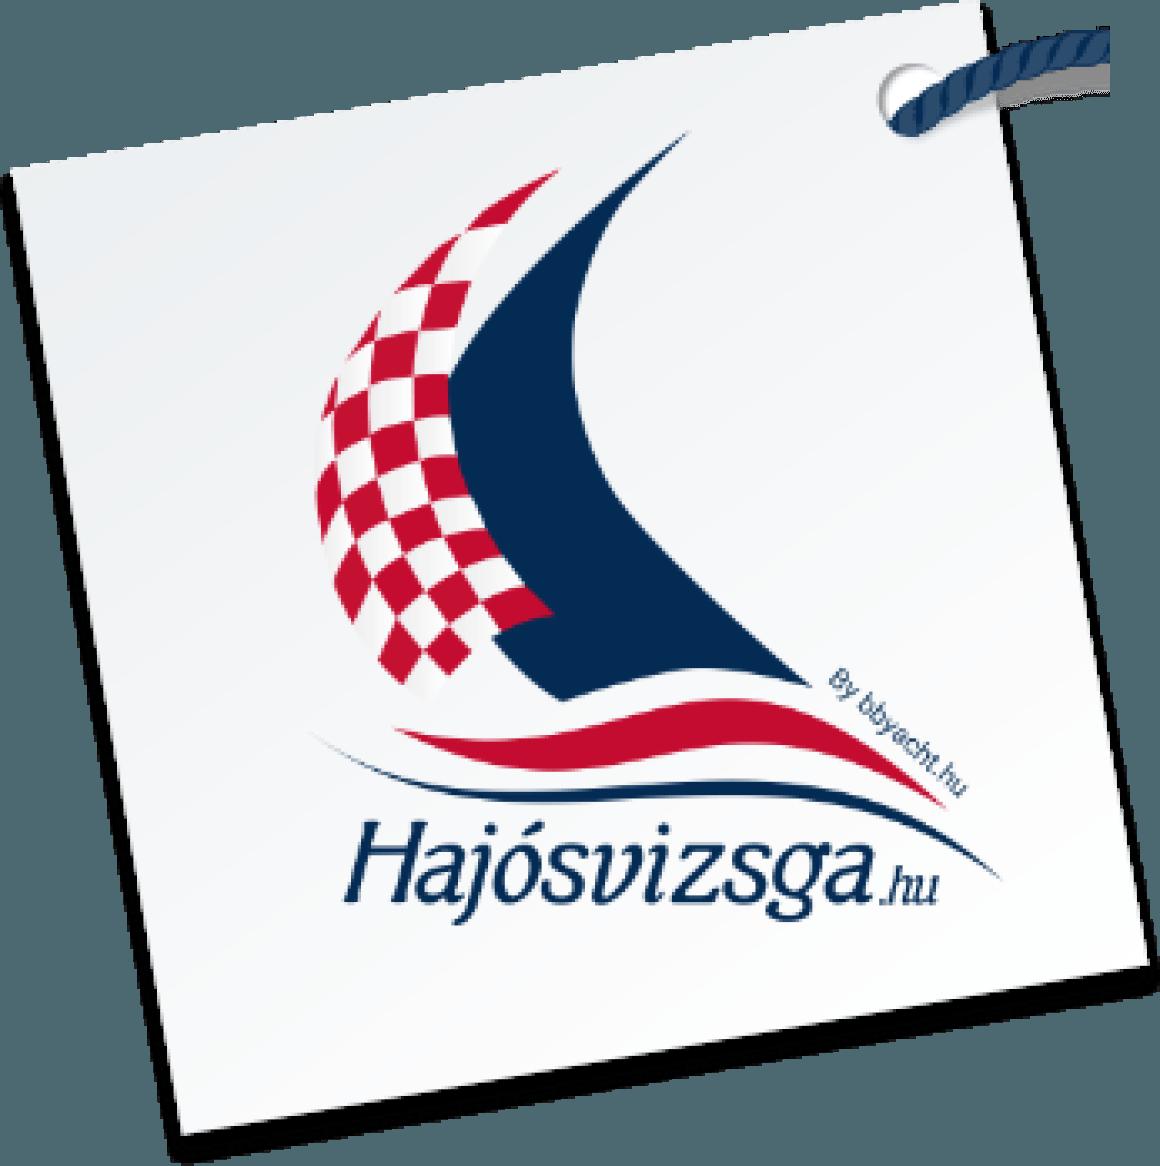 Hajósvizsga Logo